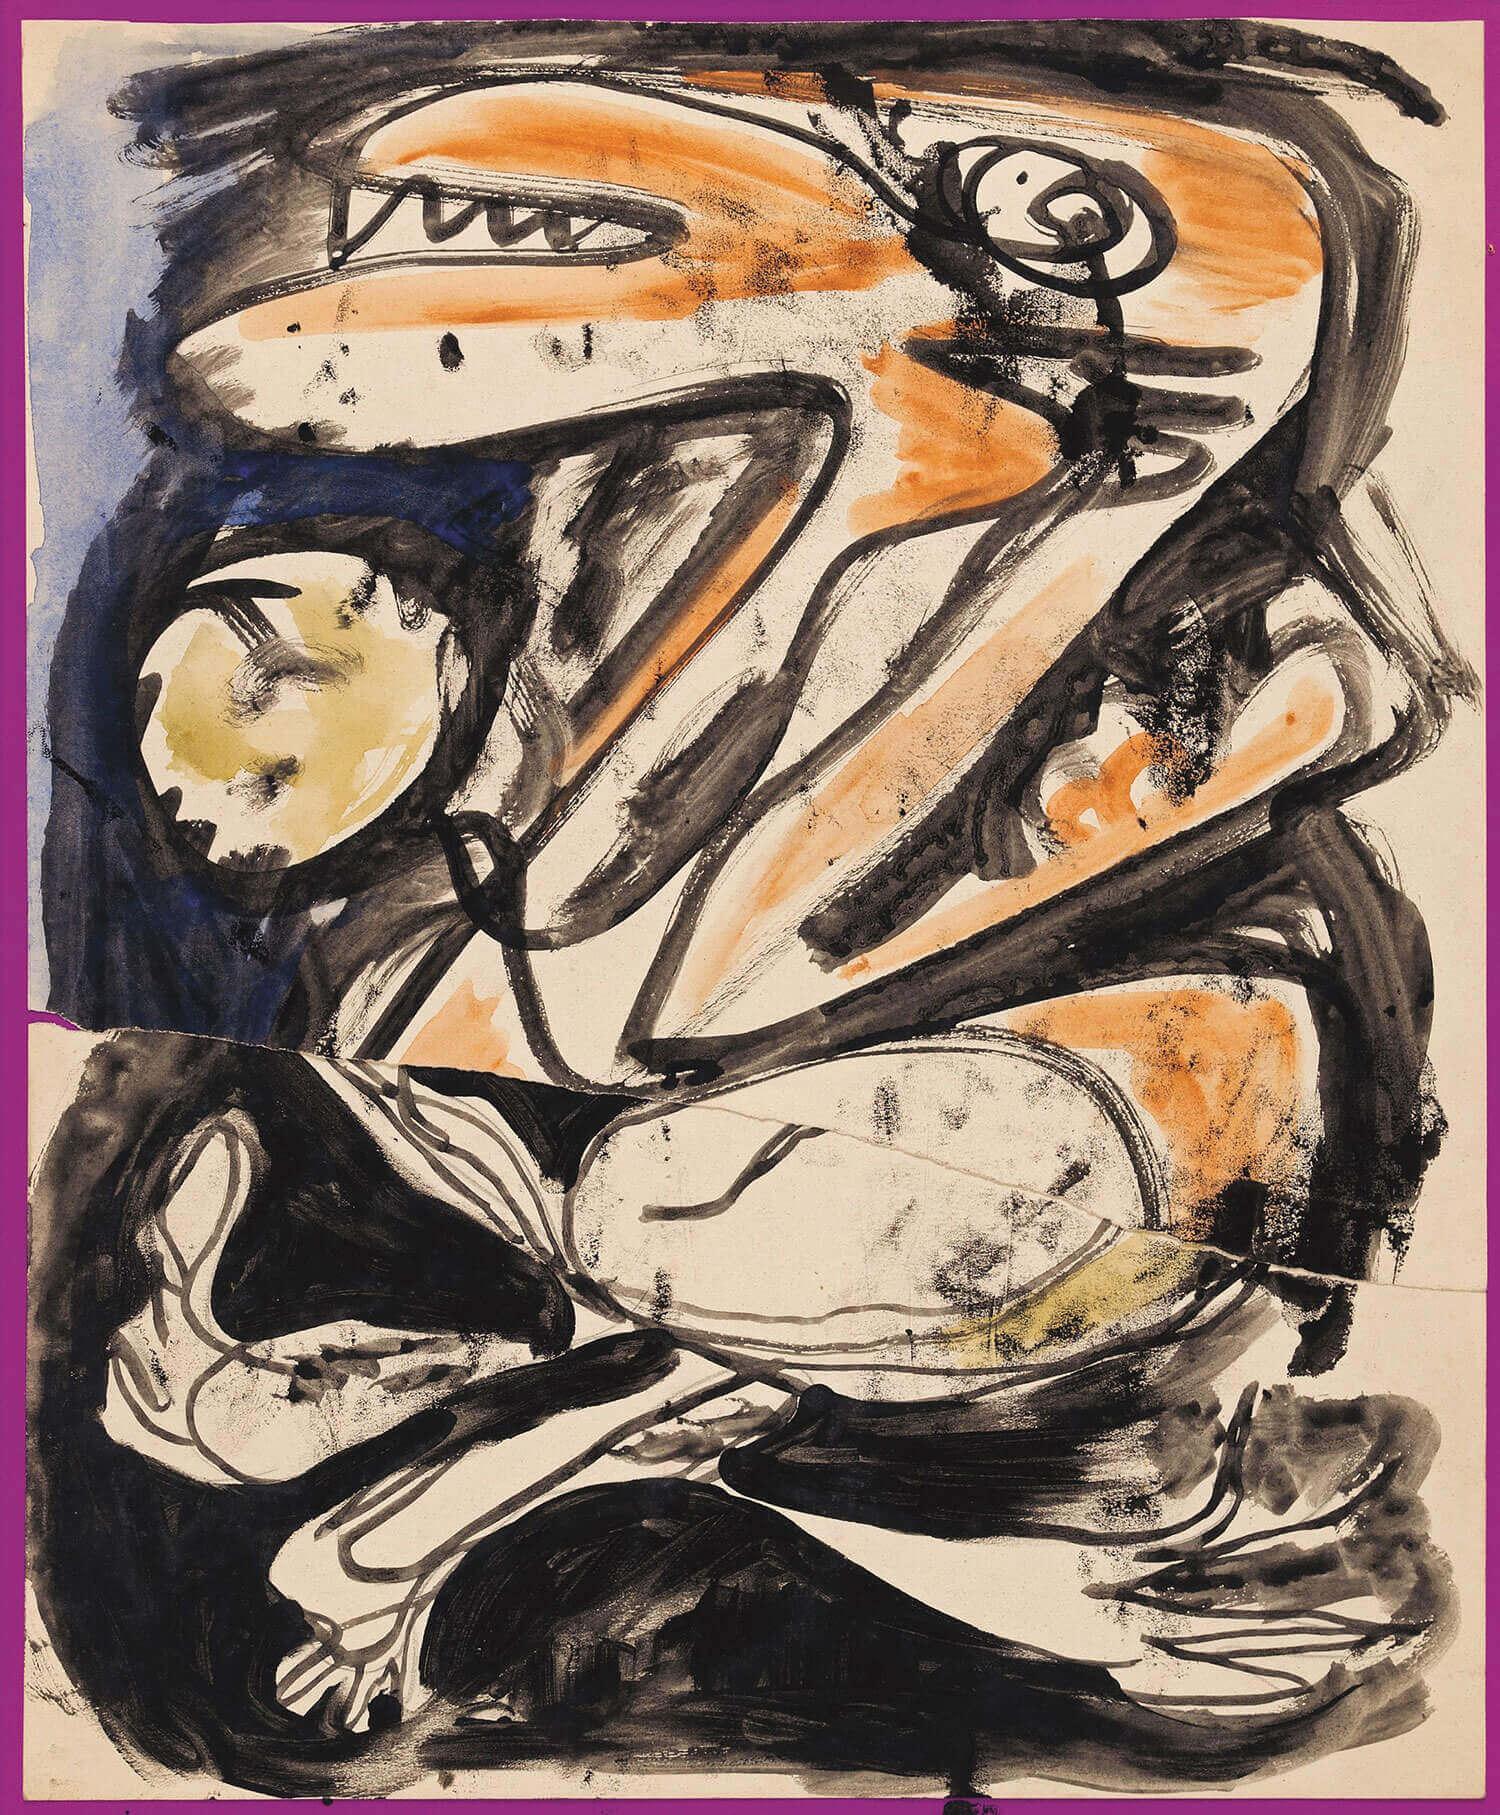 Asger Jorn:  UDEN TITEL, 1950-51 Akvarel og tusch på papir Revet over og limet op på nyt papir 400 x 330 mm